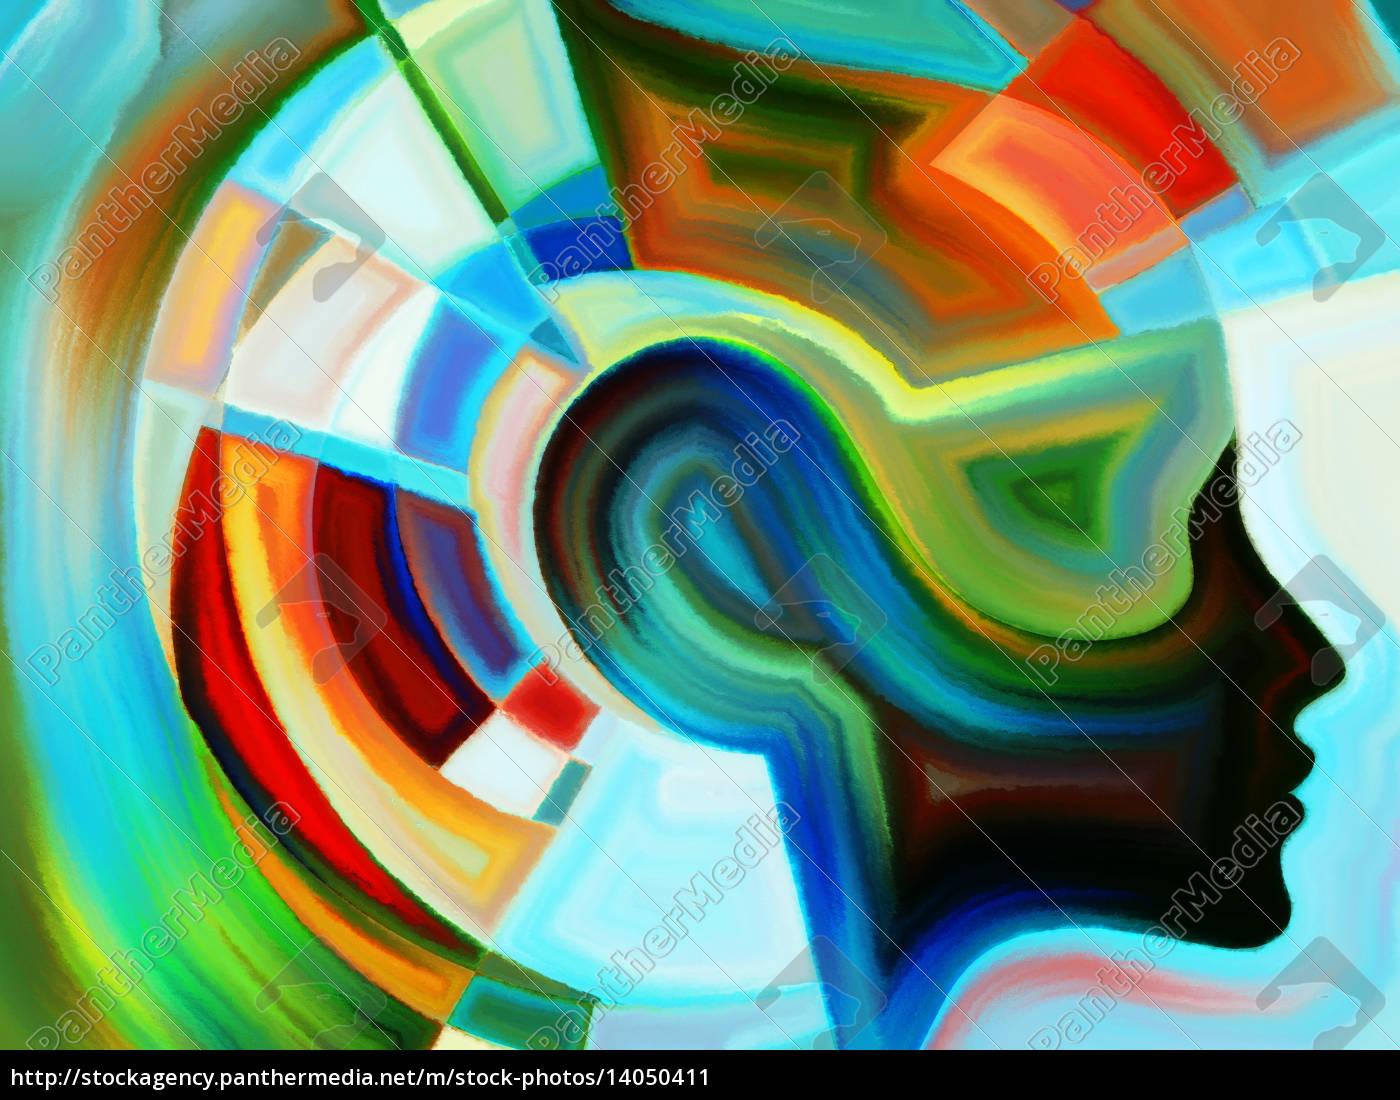 acceleration, of, inner, geometry - 14050411